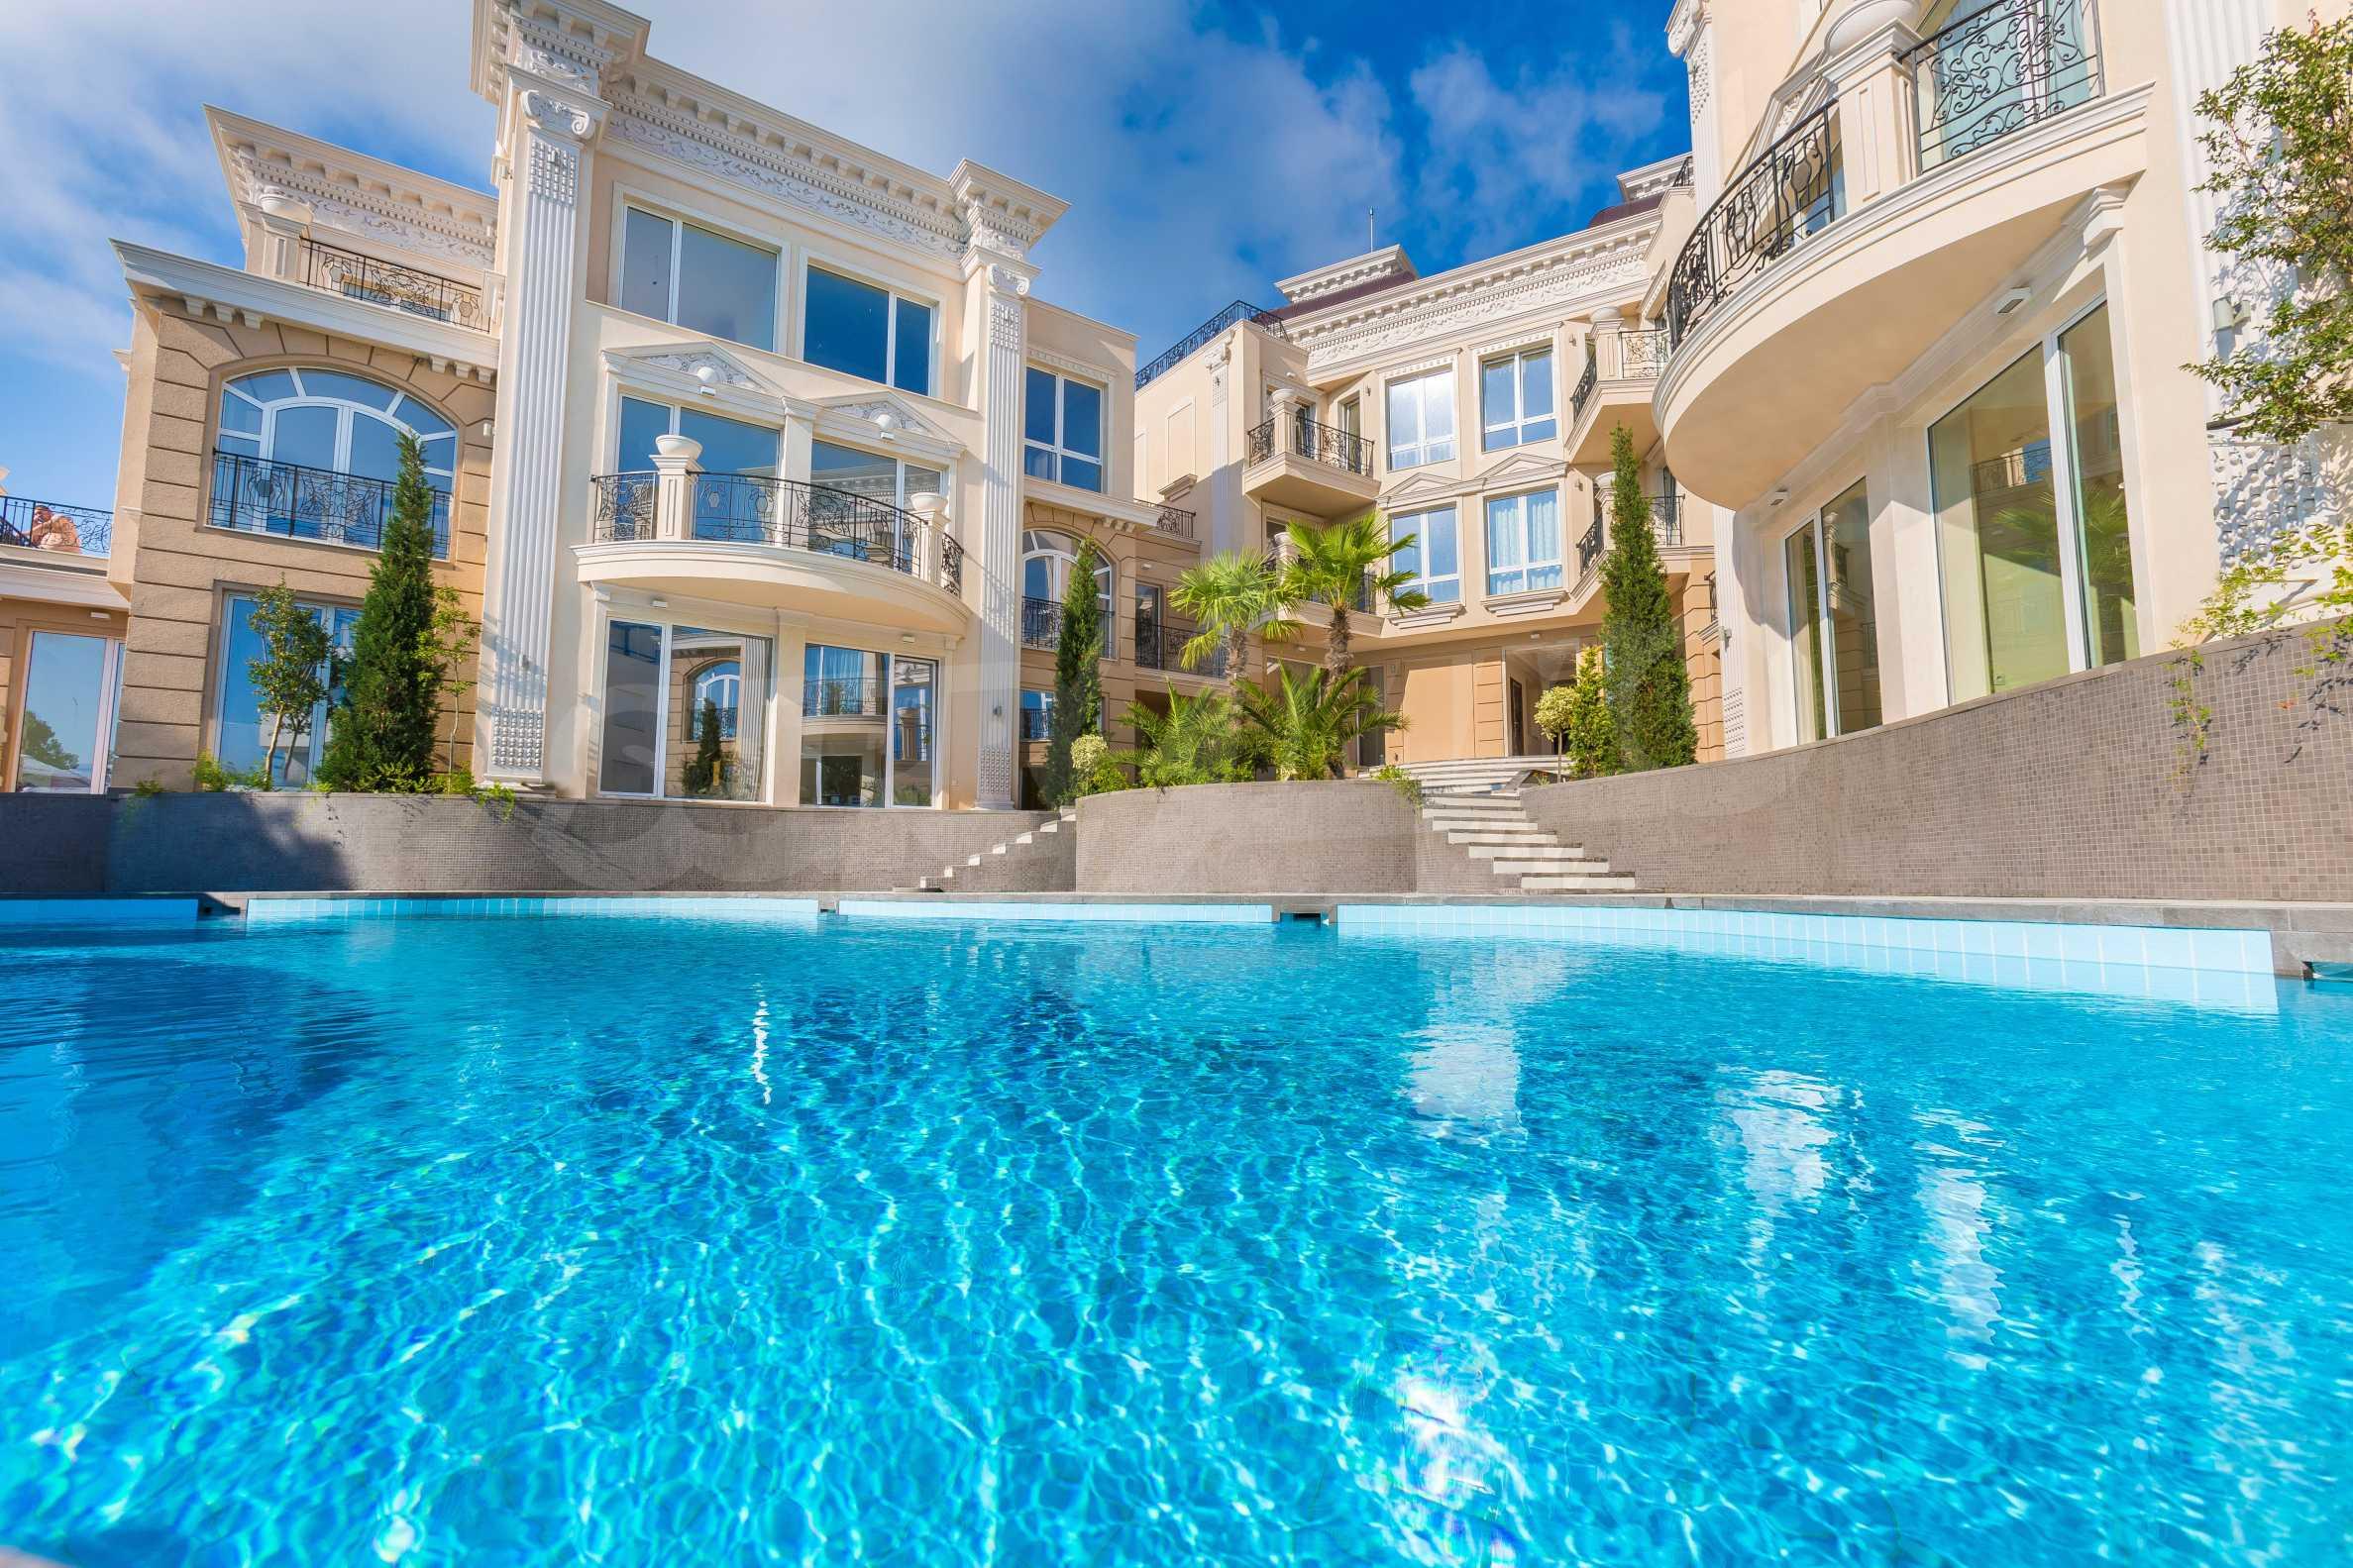 Стилен двустаен апартамент под наем в Belle Époque Beach Residence 16